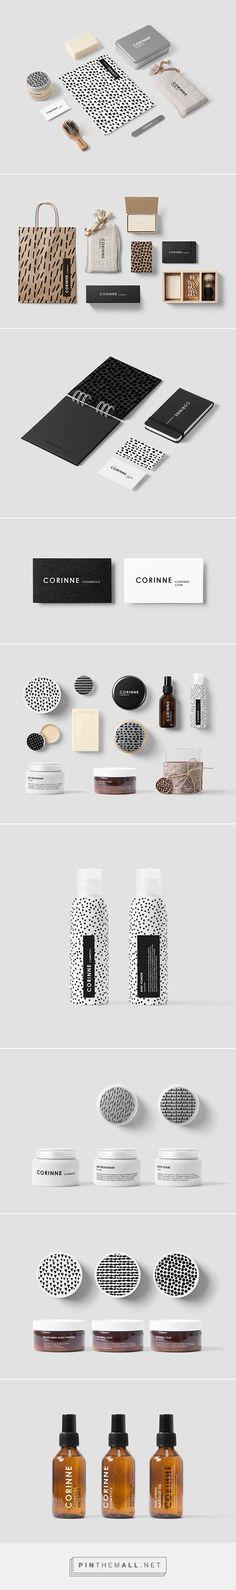 Beautiful branding goes back to nature   Branding   Creative Bloq #Design